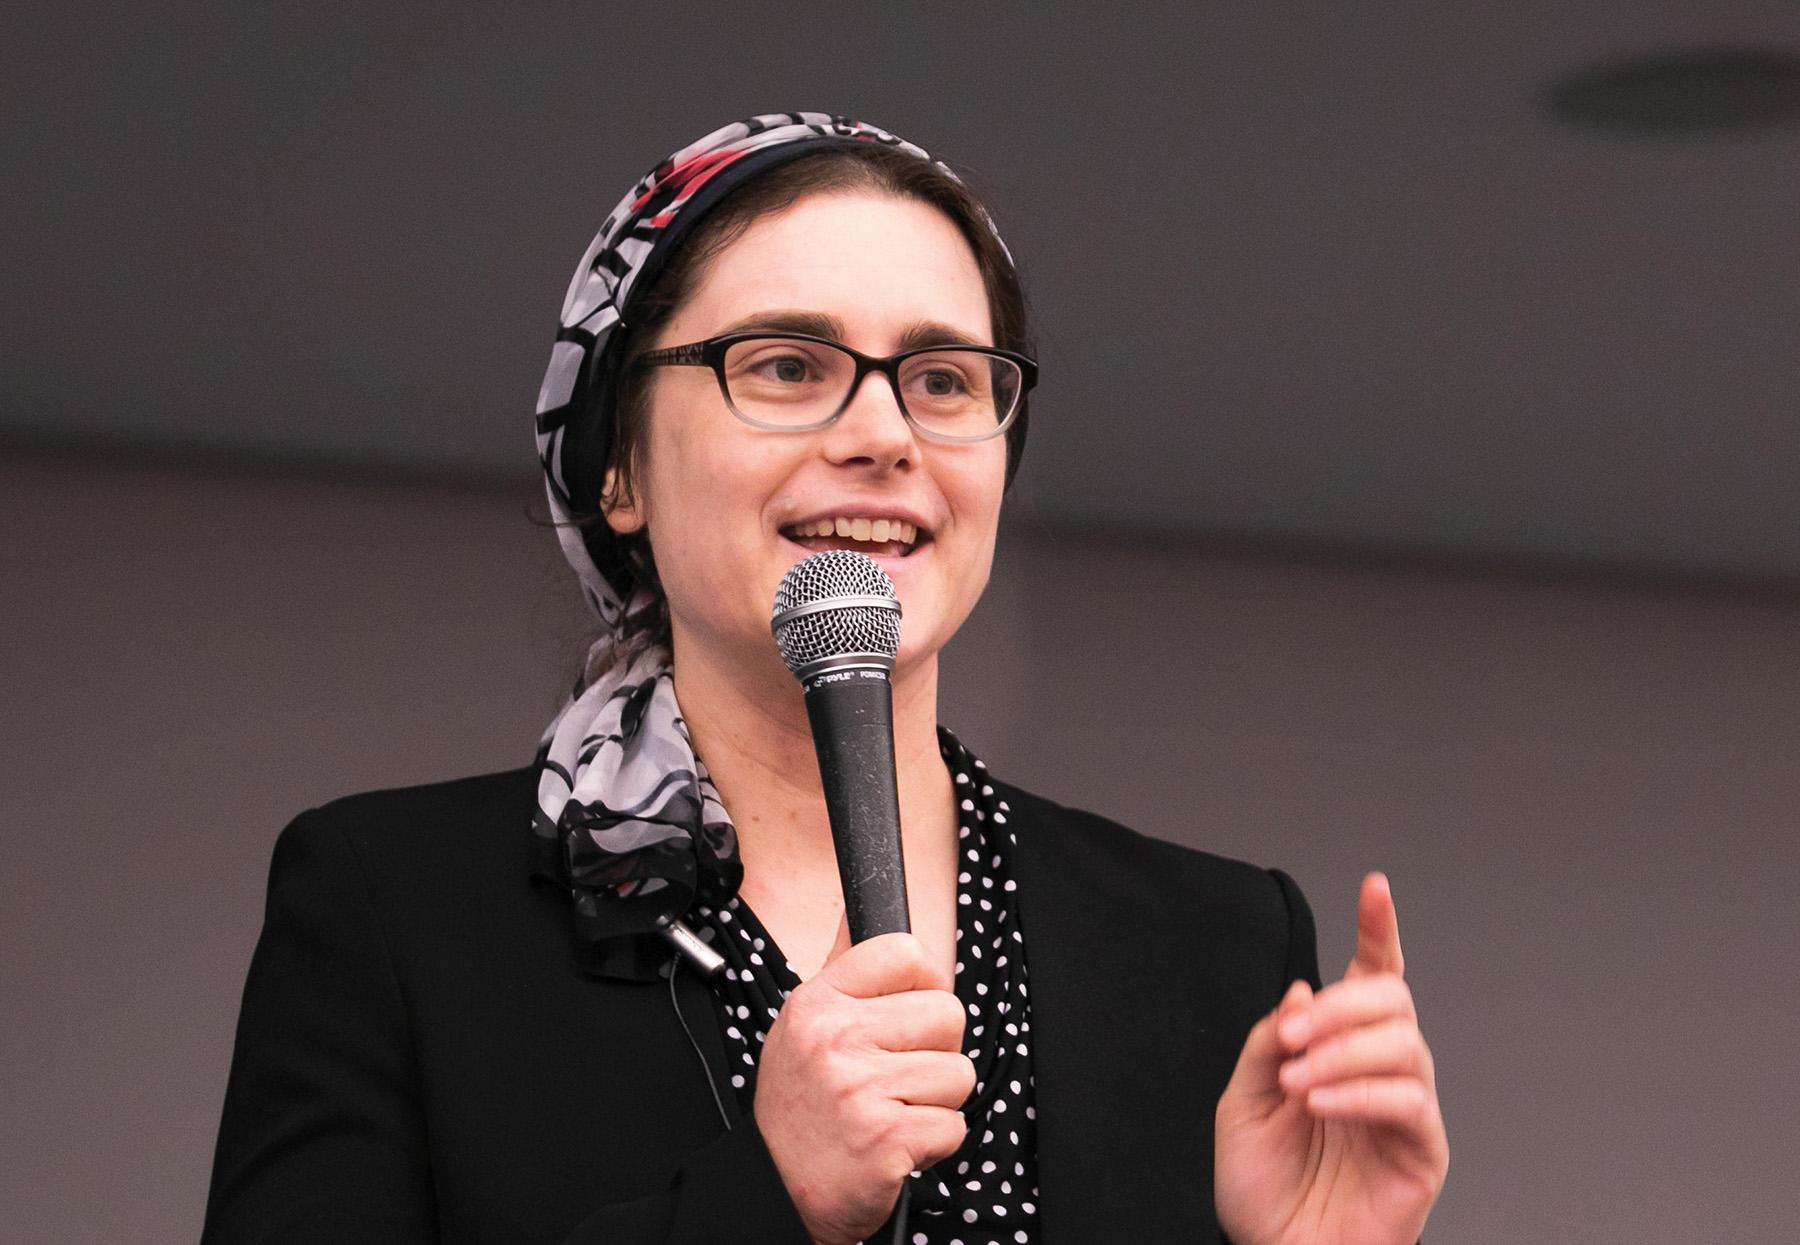 Rabbi Aviva Richman teaches at Hadar. Photos courtesy of Hadar